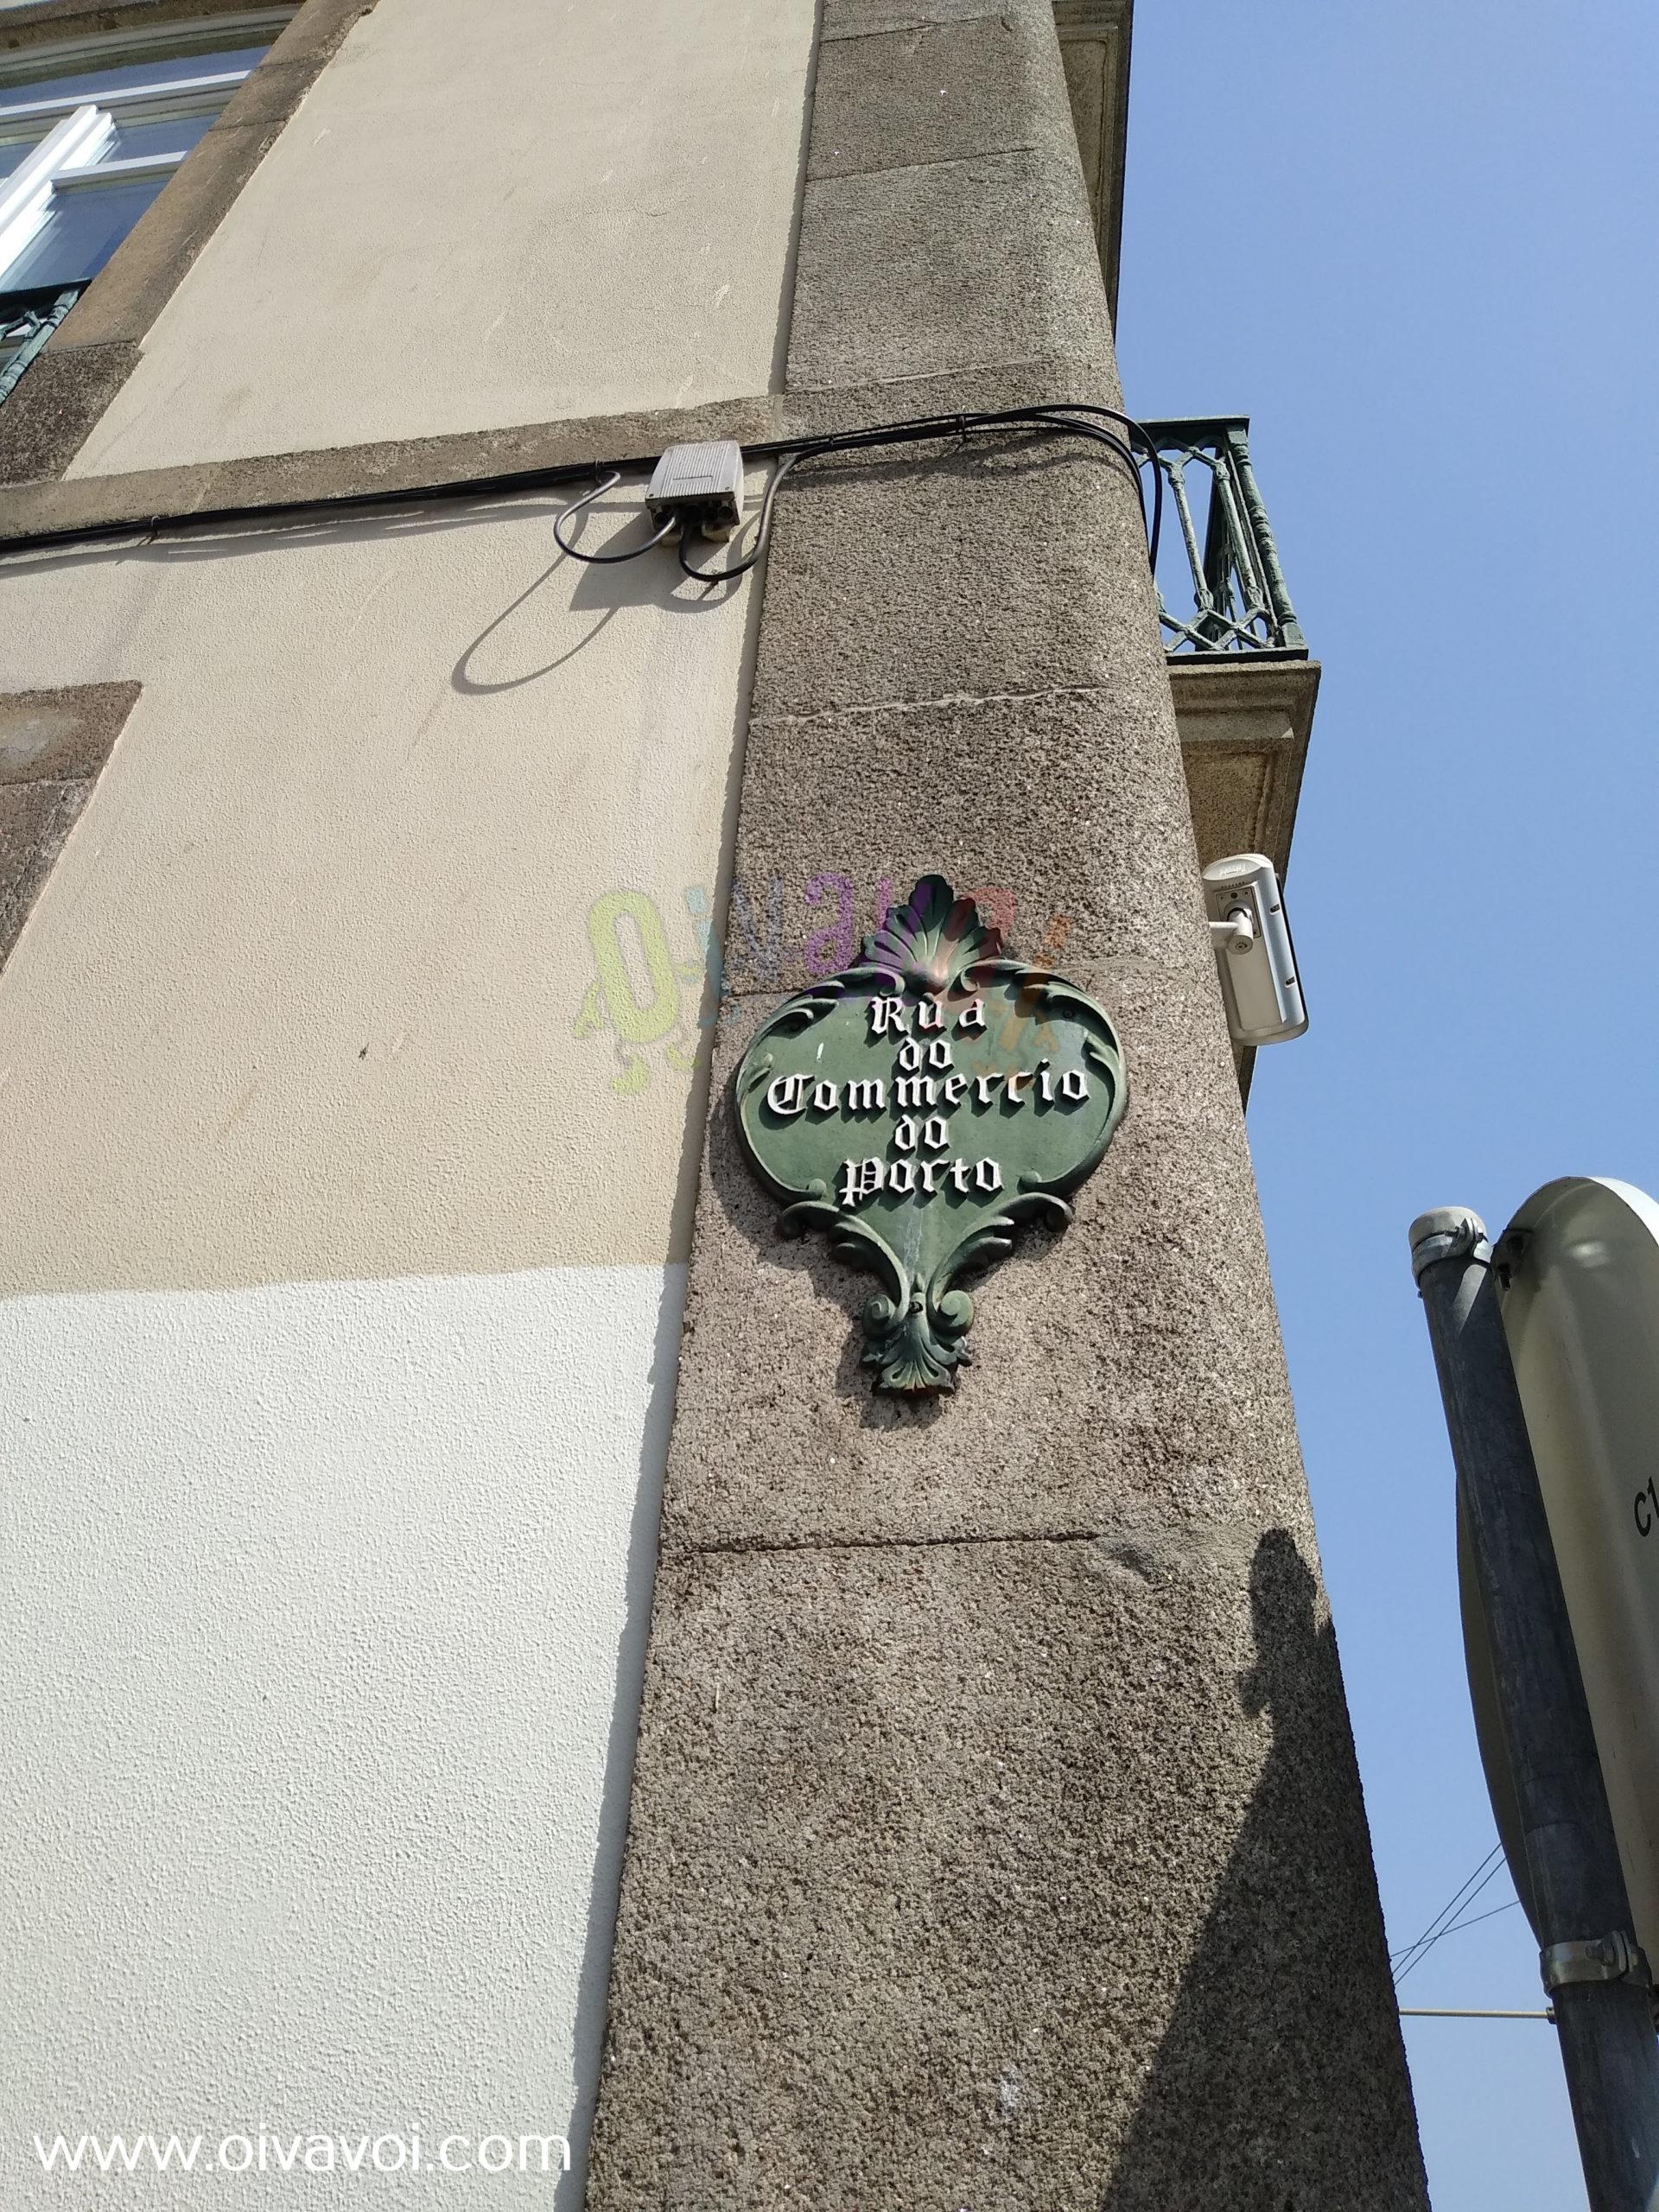 Rua do Commercio de Porto